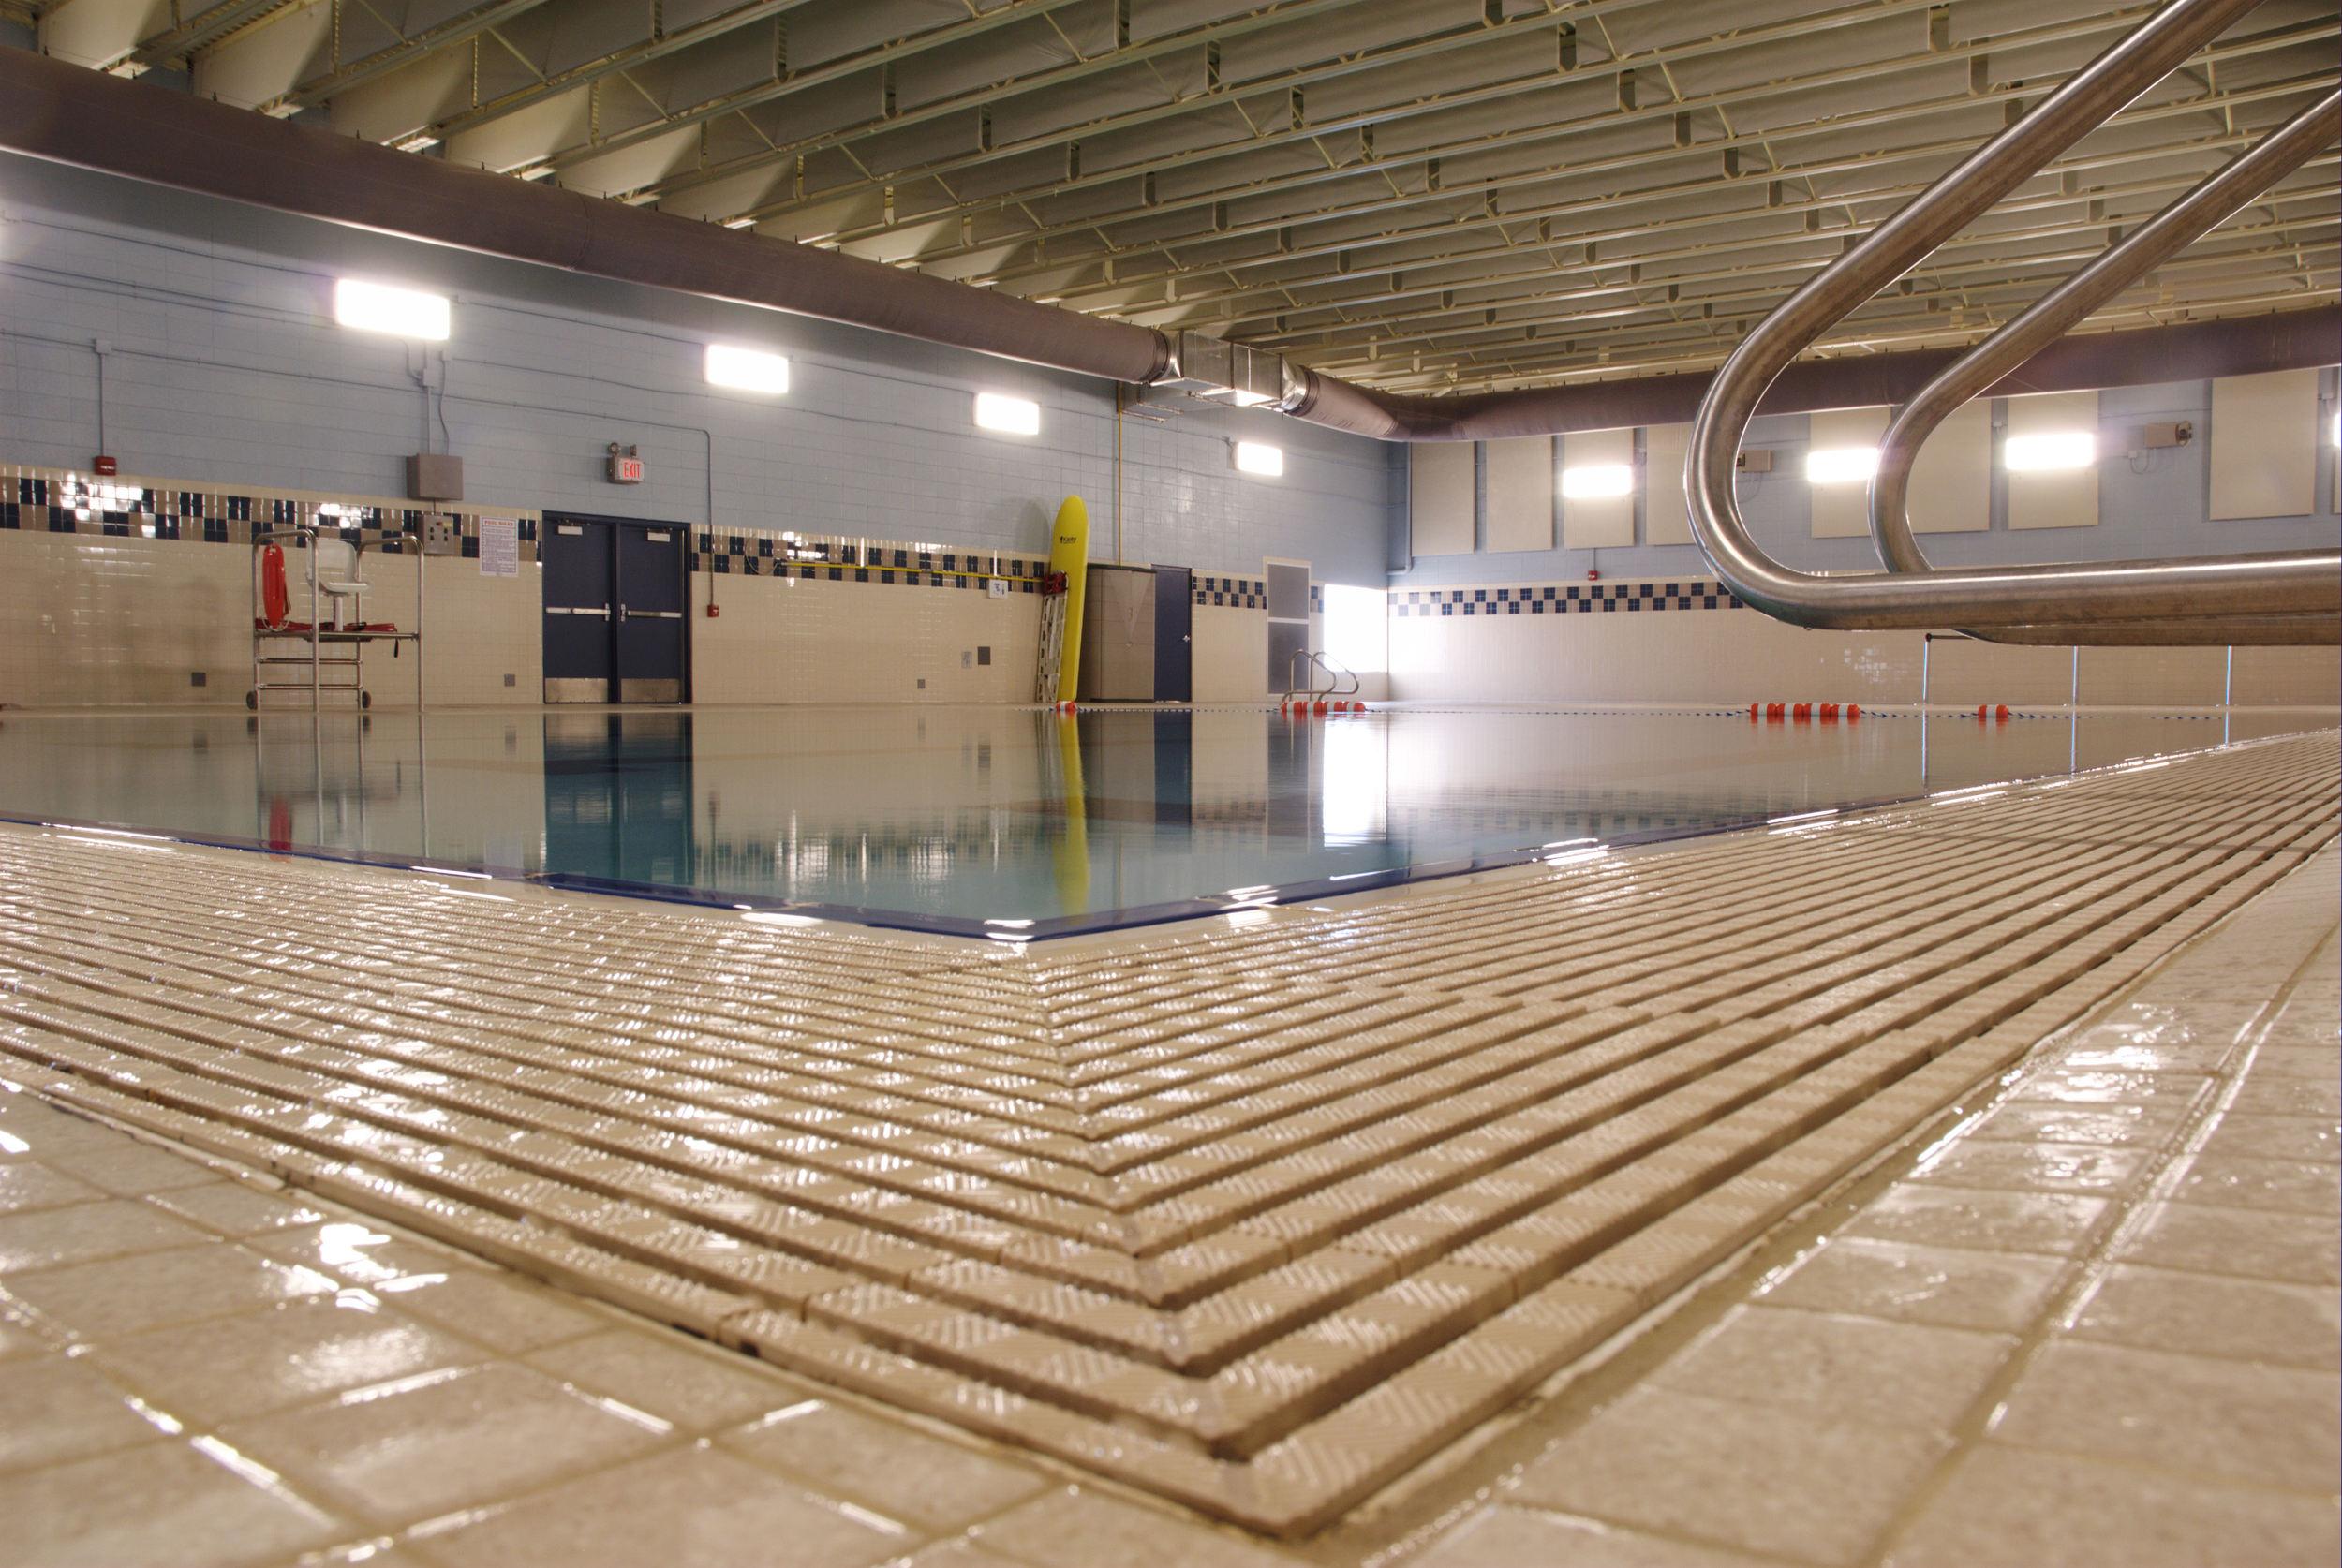 Zoomed in pool deck drains at Poynette High School in Poynette, WI